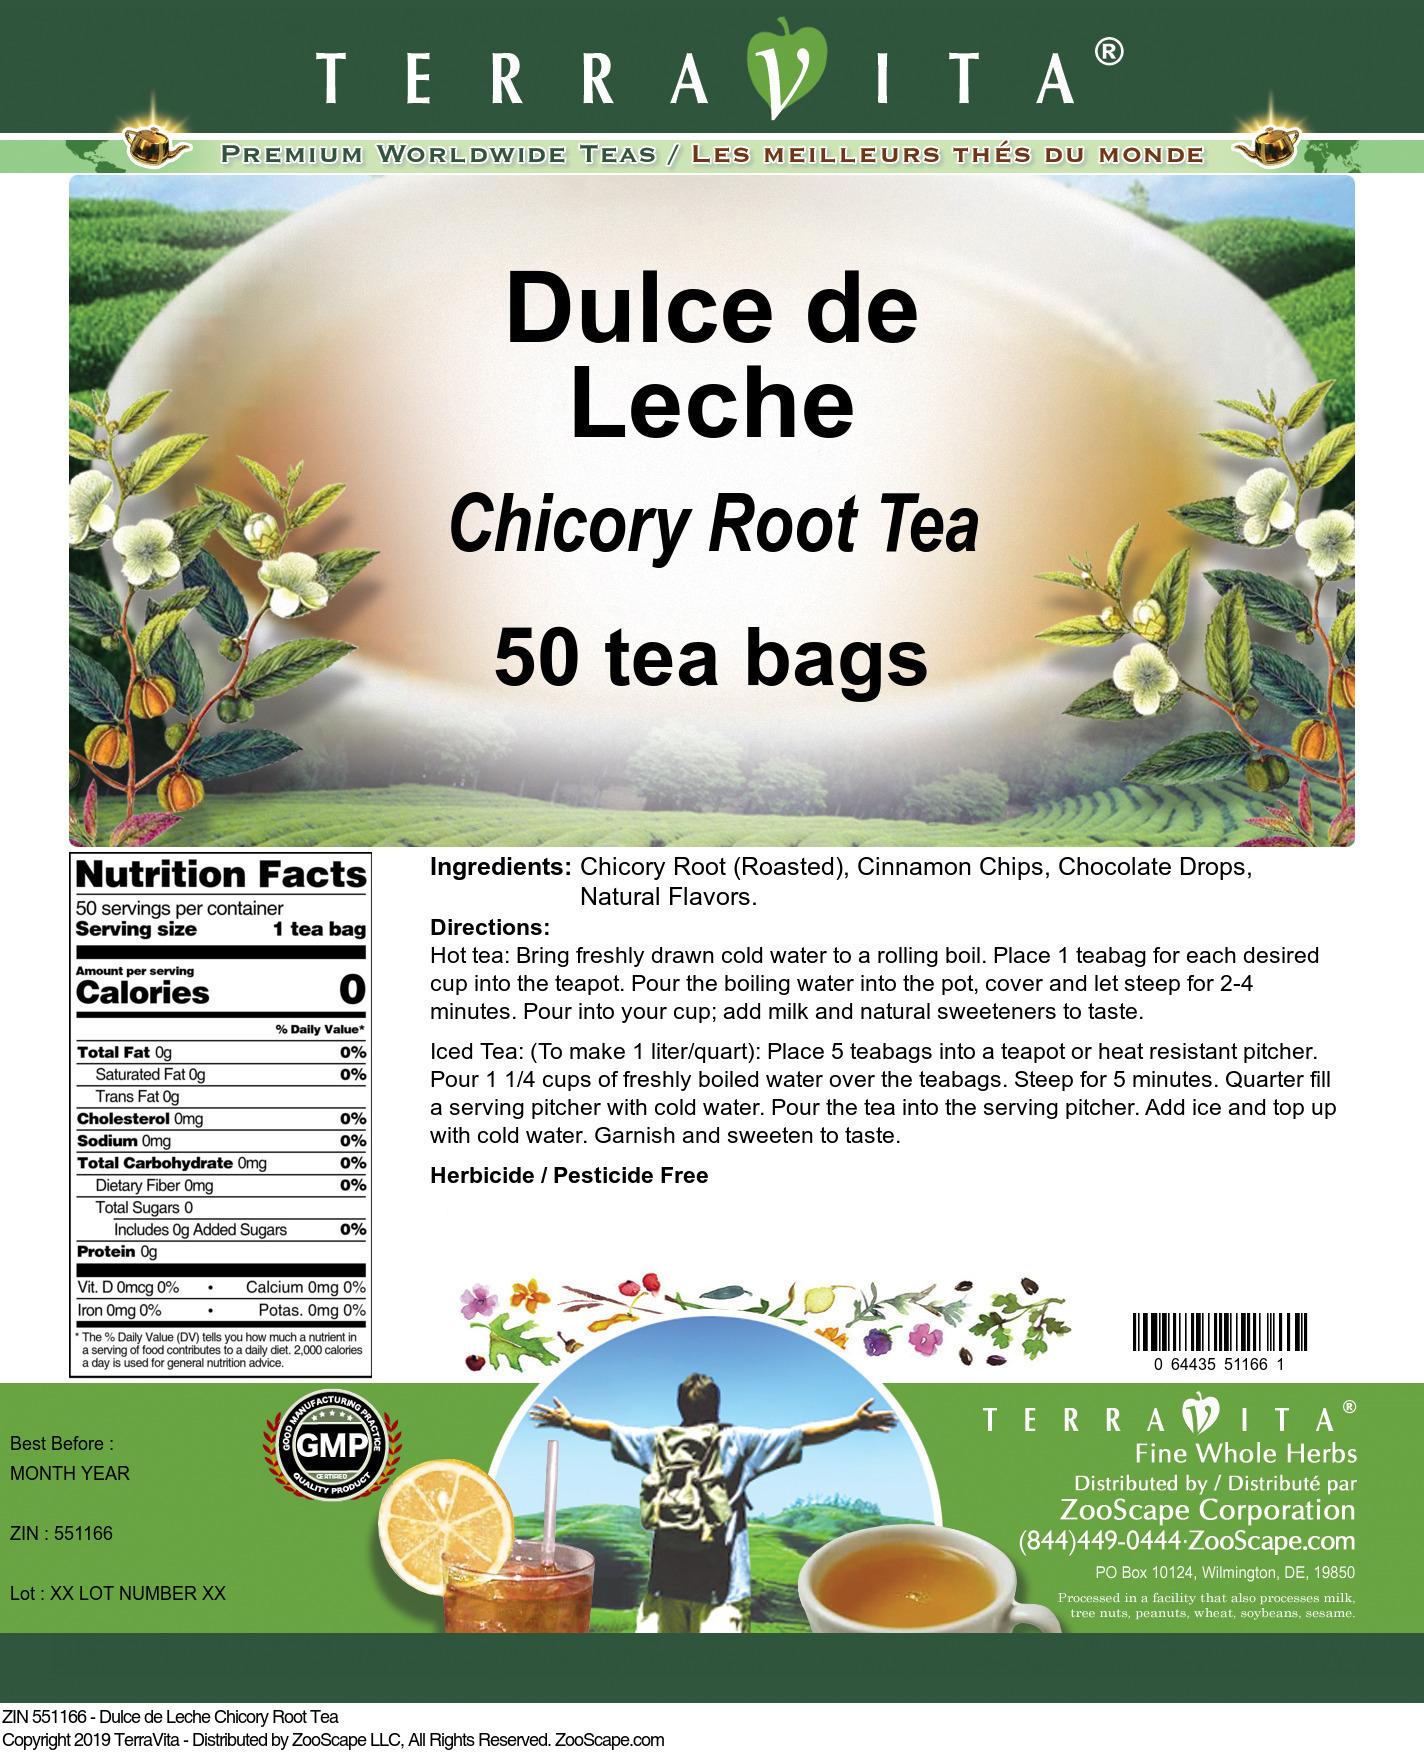 Dulce de Leche Chicory Root